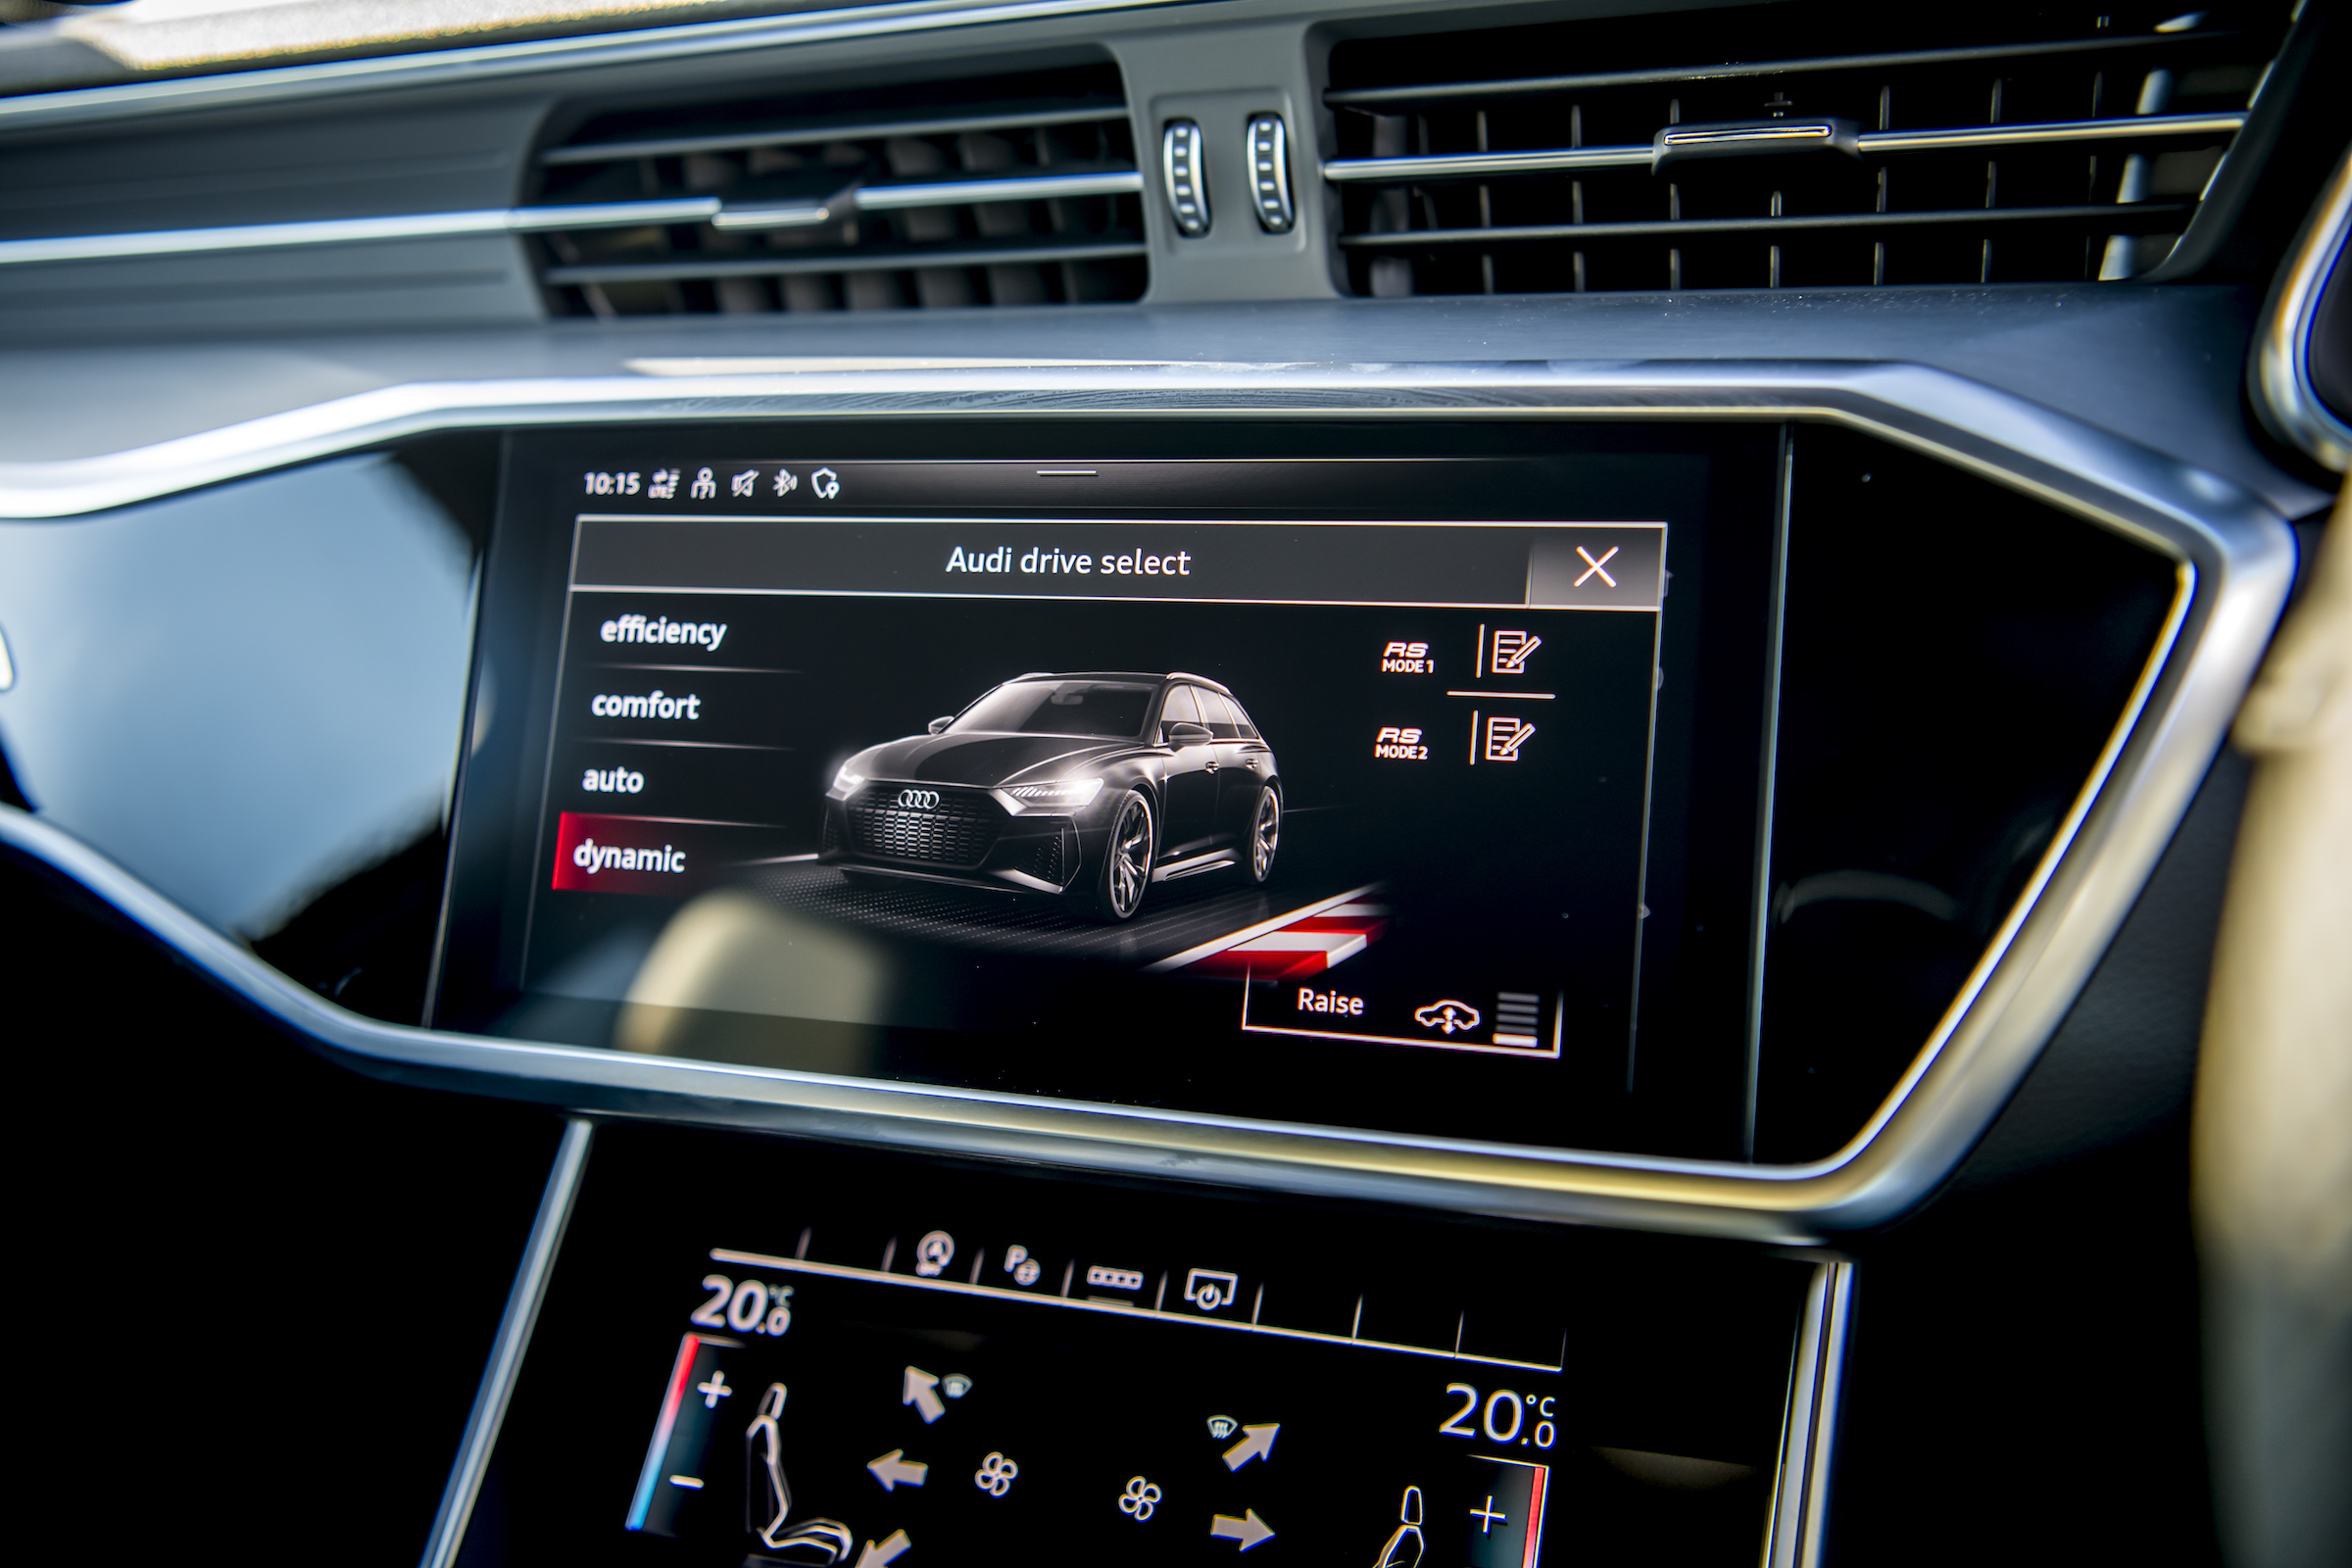 Audi RS6 interior drive modes screen